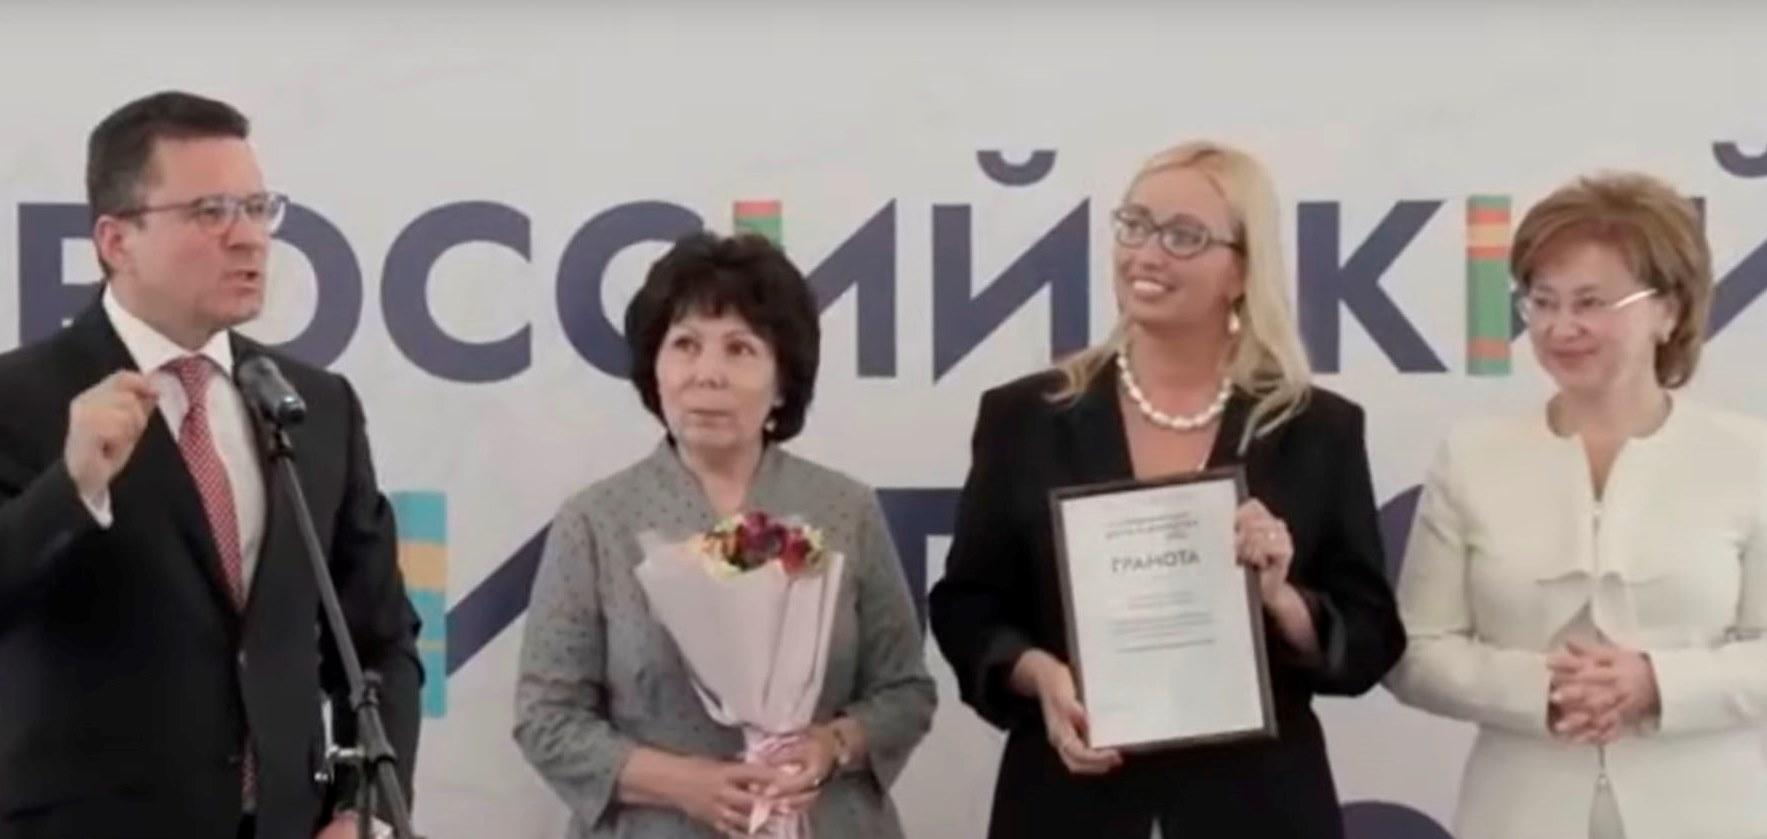 Библиотека получила награду. В. Дуда, Т. Брагина, А. Бирюкова